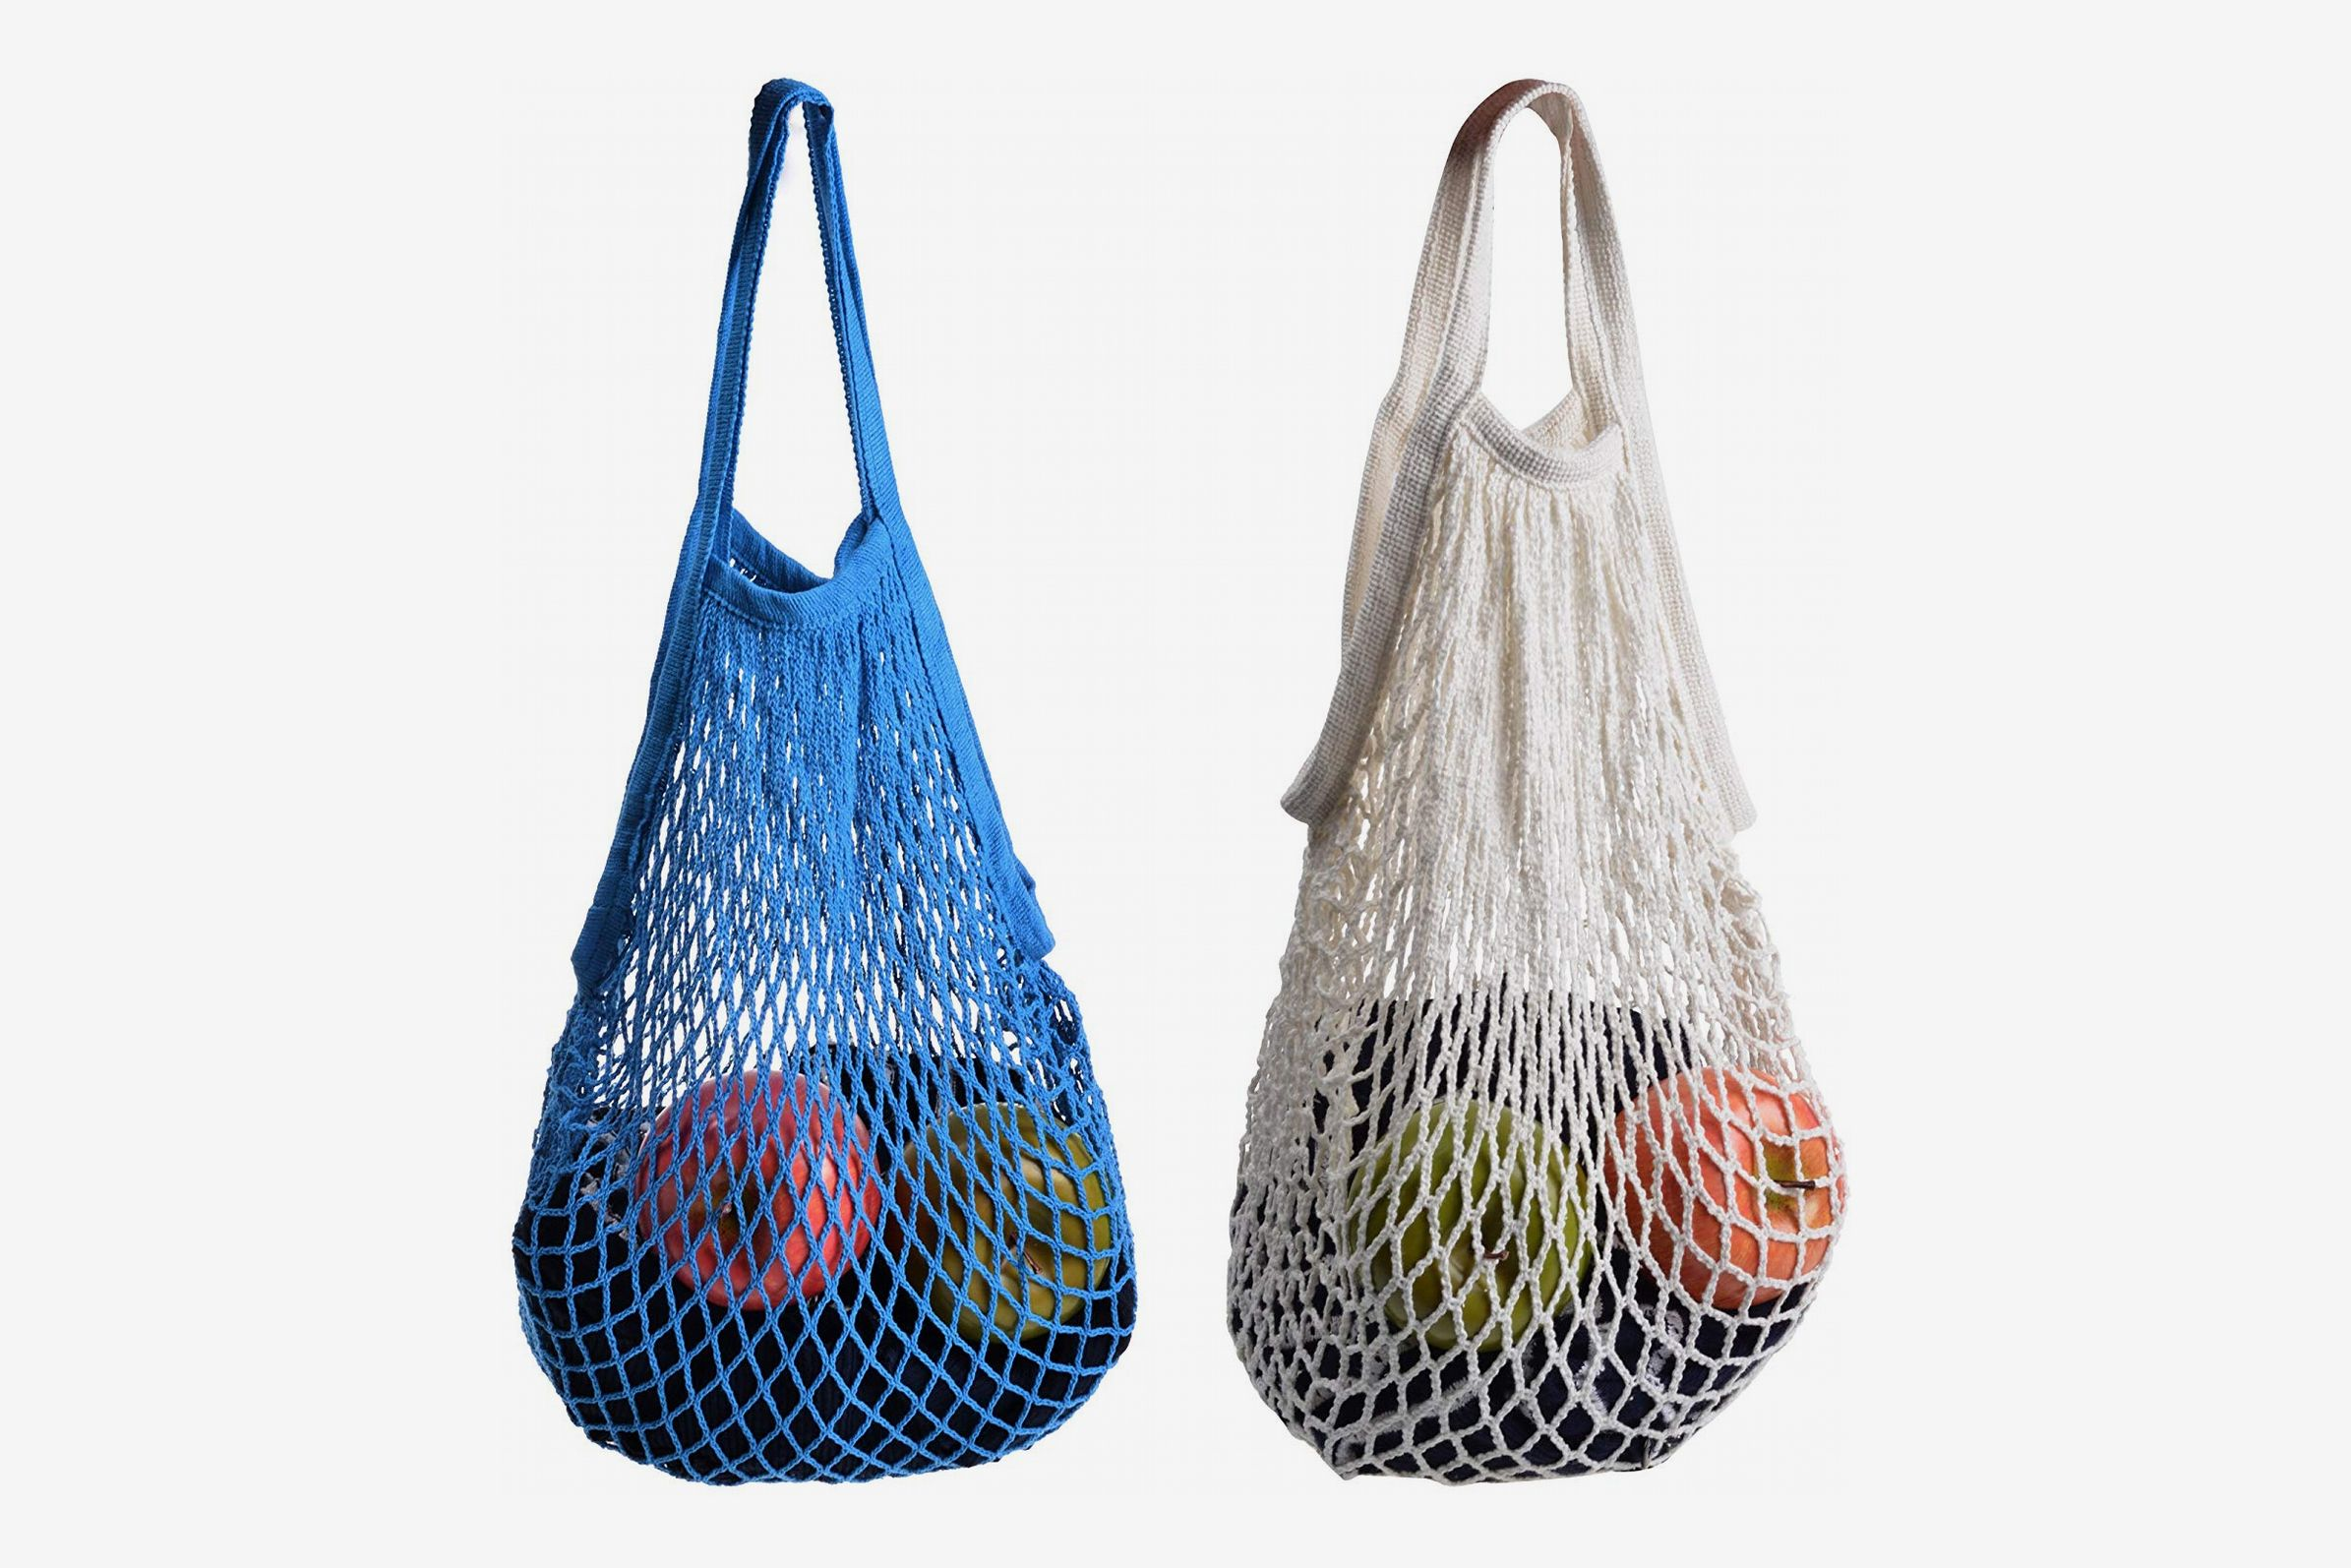 Printed Tote Bag Eco-Friendly Shopping Bag Reusable Market Bag Grandpa Bag Cute Tote Grandpa Est 2021 Canvas Tote Bag Cotton Tote Bag